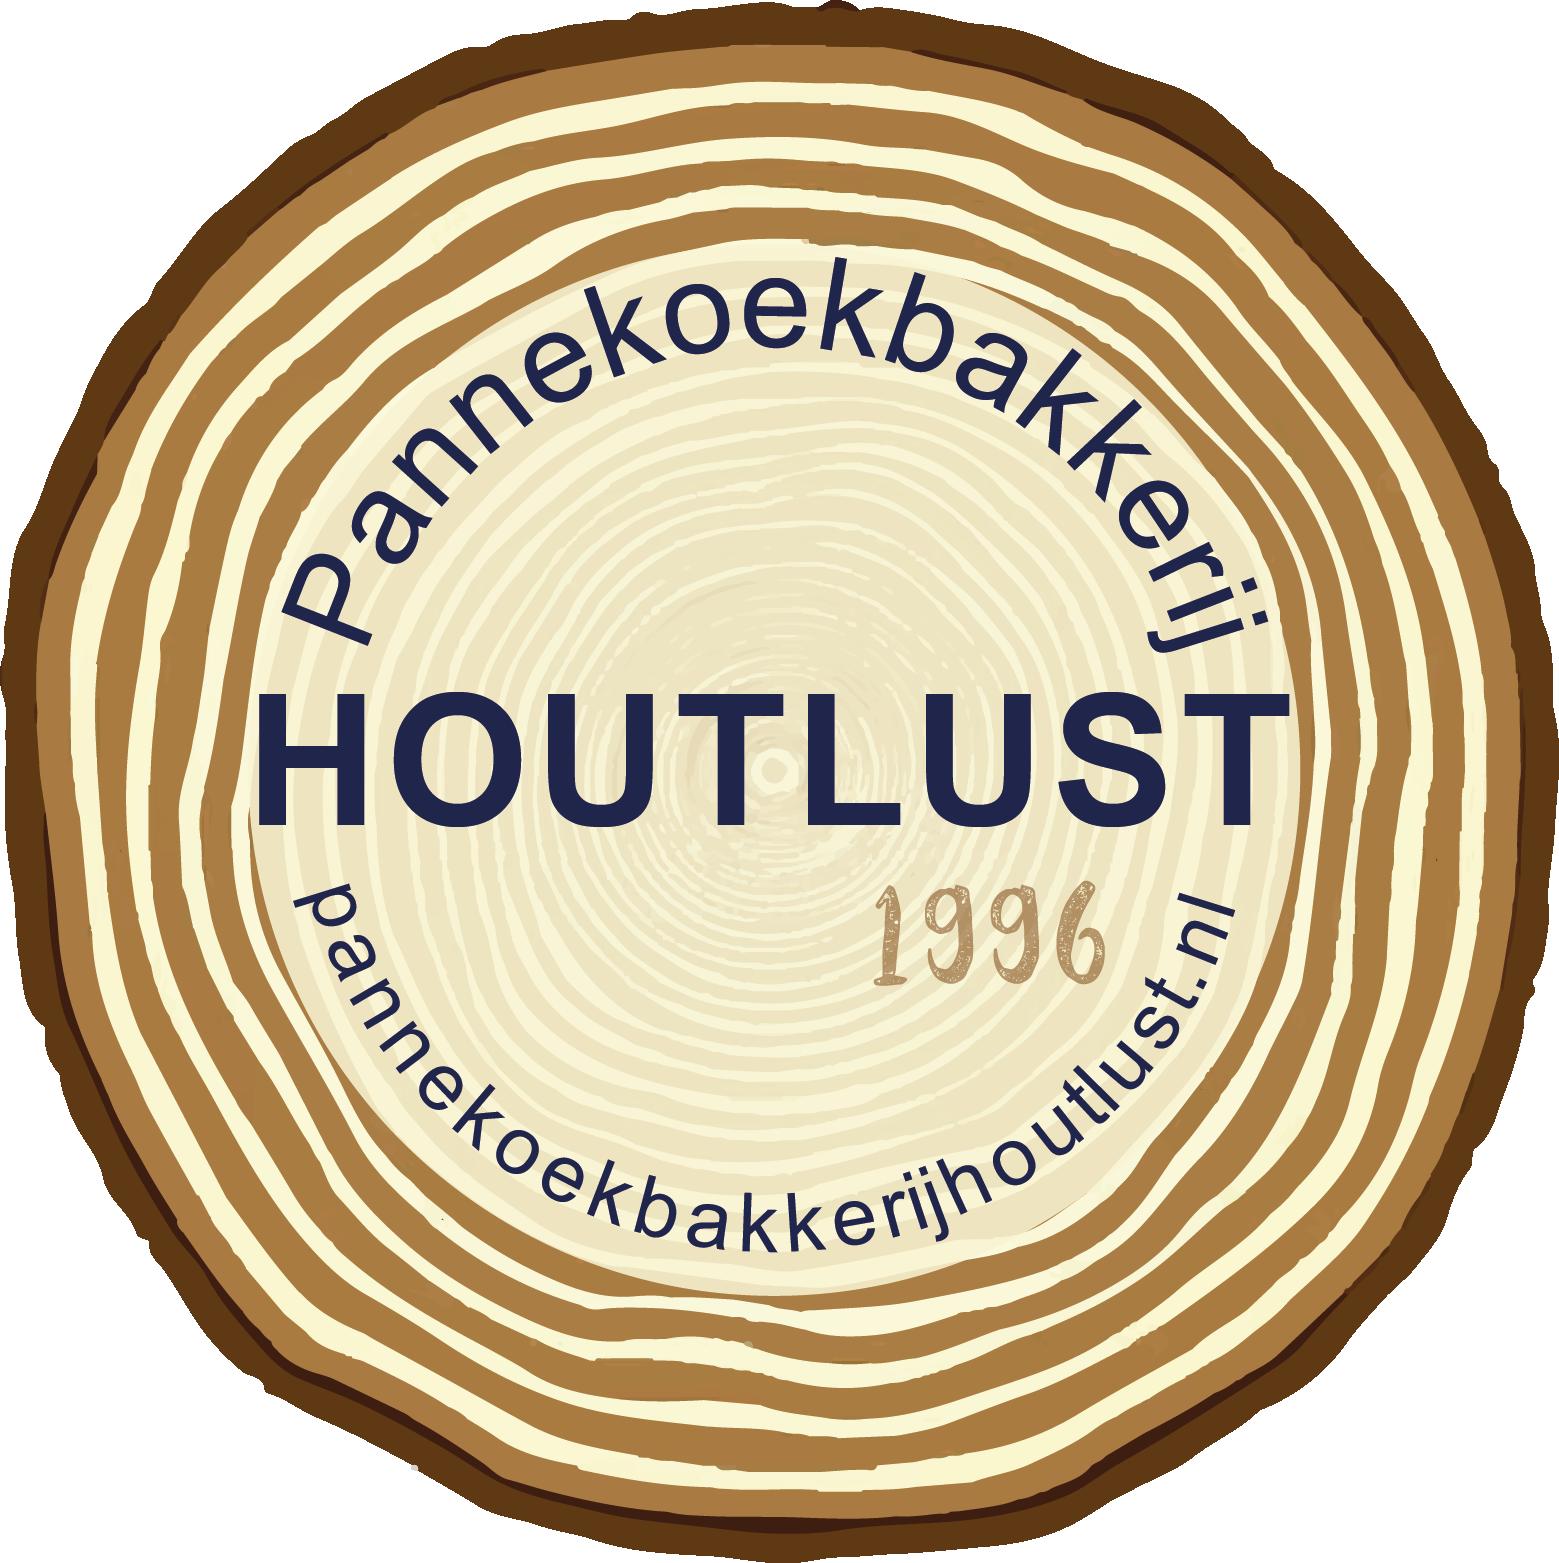 Pannekoekbakkerij Houtlust